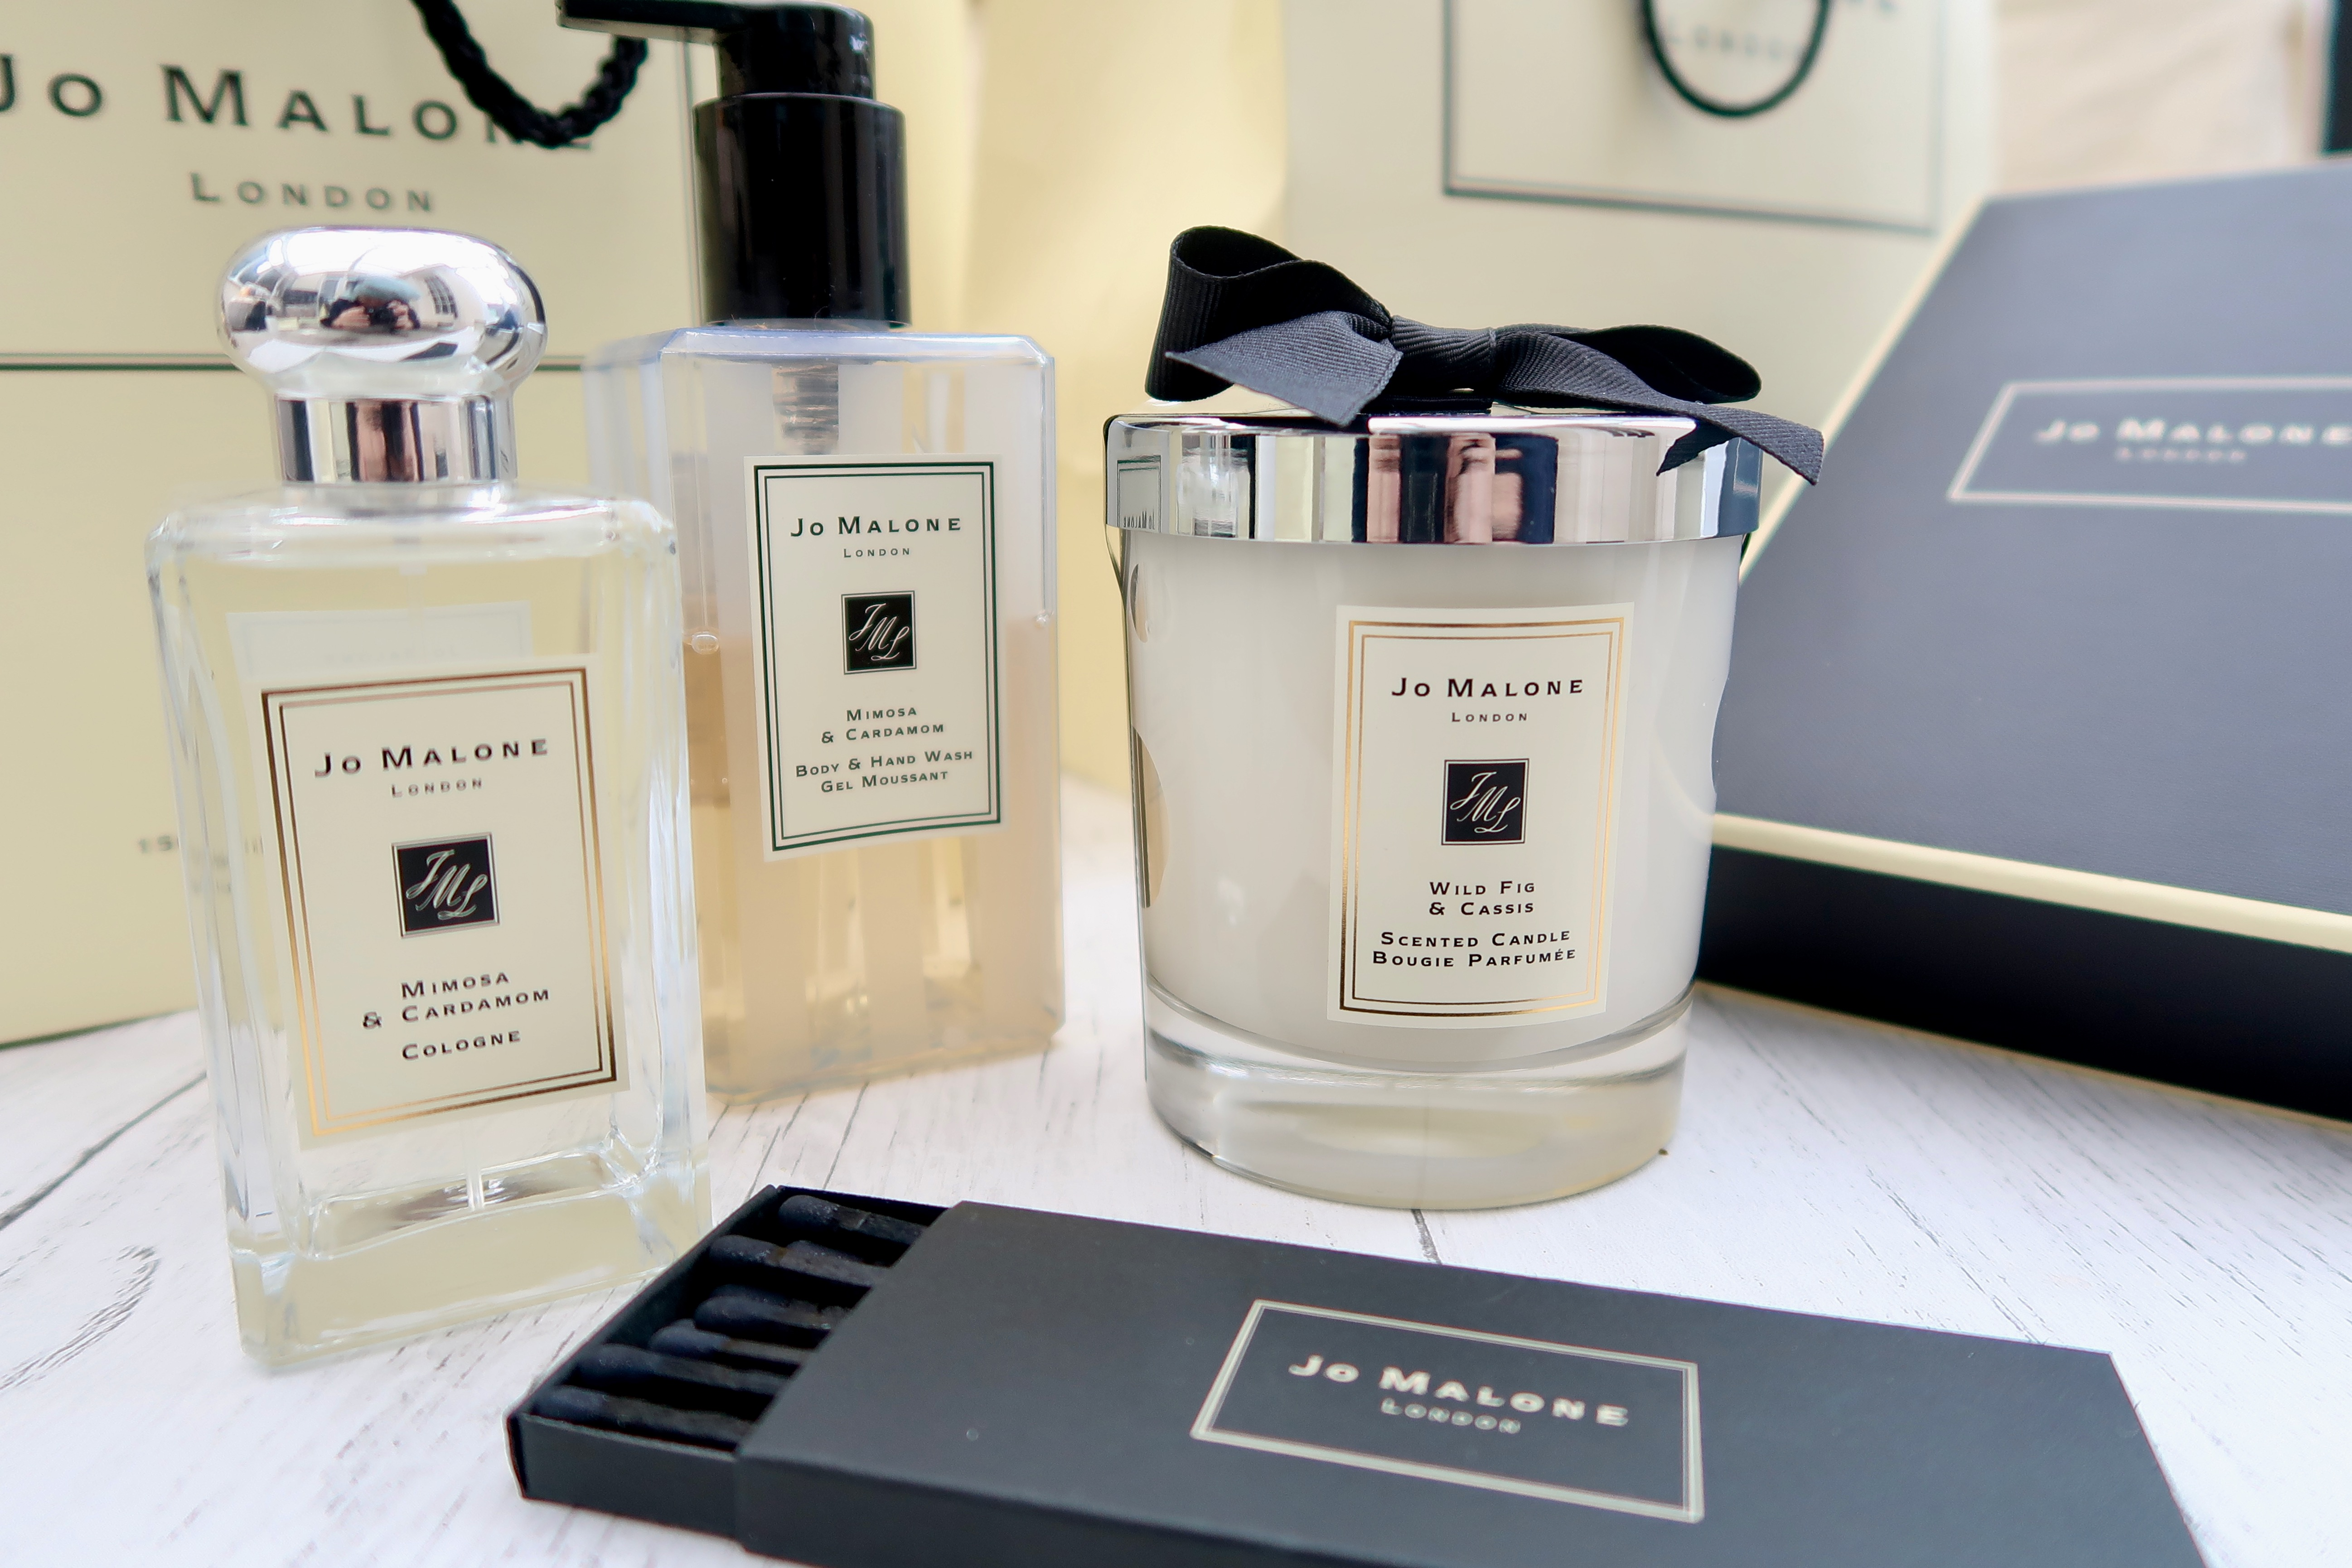 Aldi Luxury Advent Calendar   Jo Malone vs Aldi Number   Splurge vs Save   Honest Review of the new Aldi bath & body range   Elle Blonde Luxury Lifestyle Destination Blog